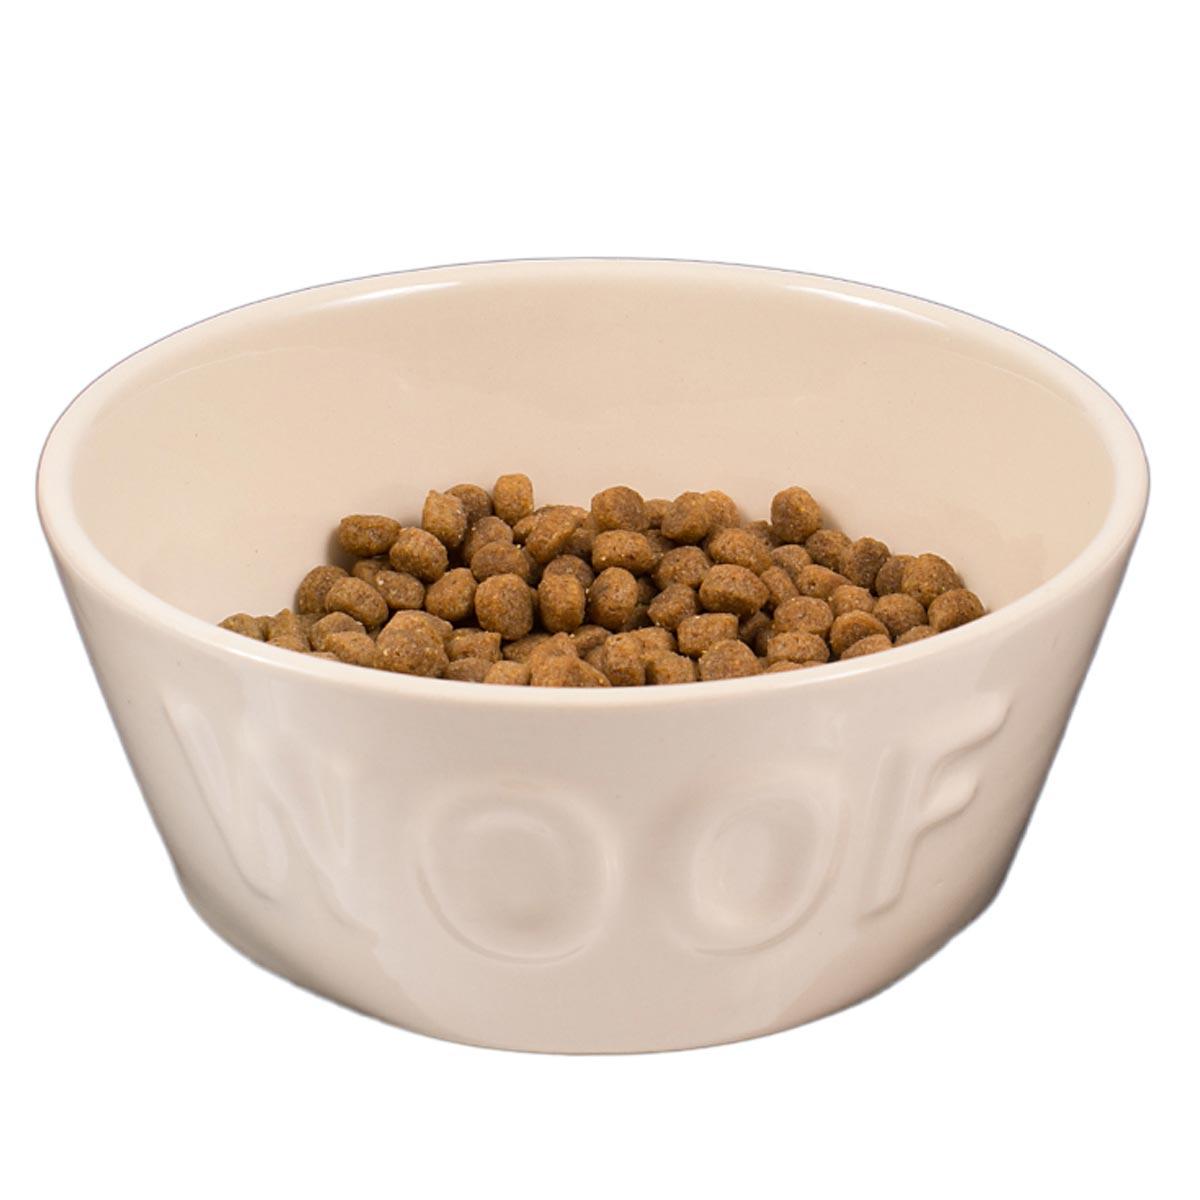 Comedouro Woof para Cachorro e Gato Esmaltado Bege